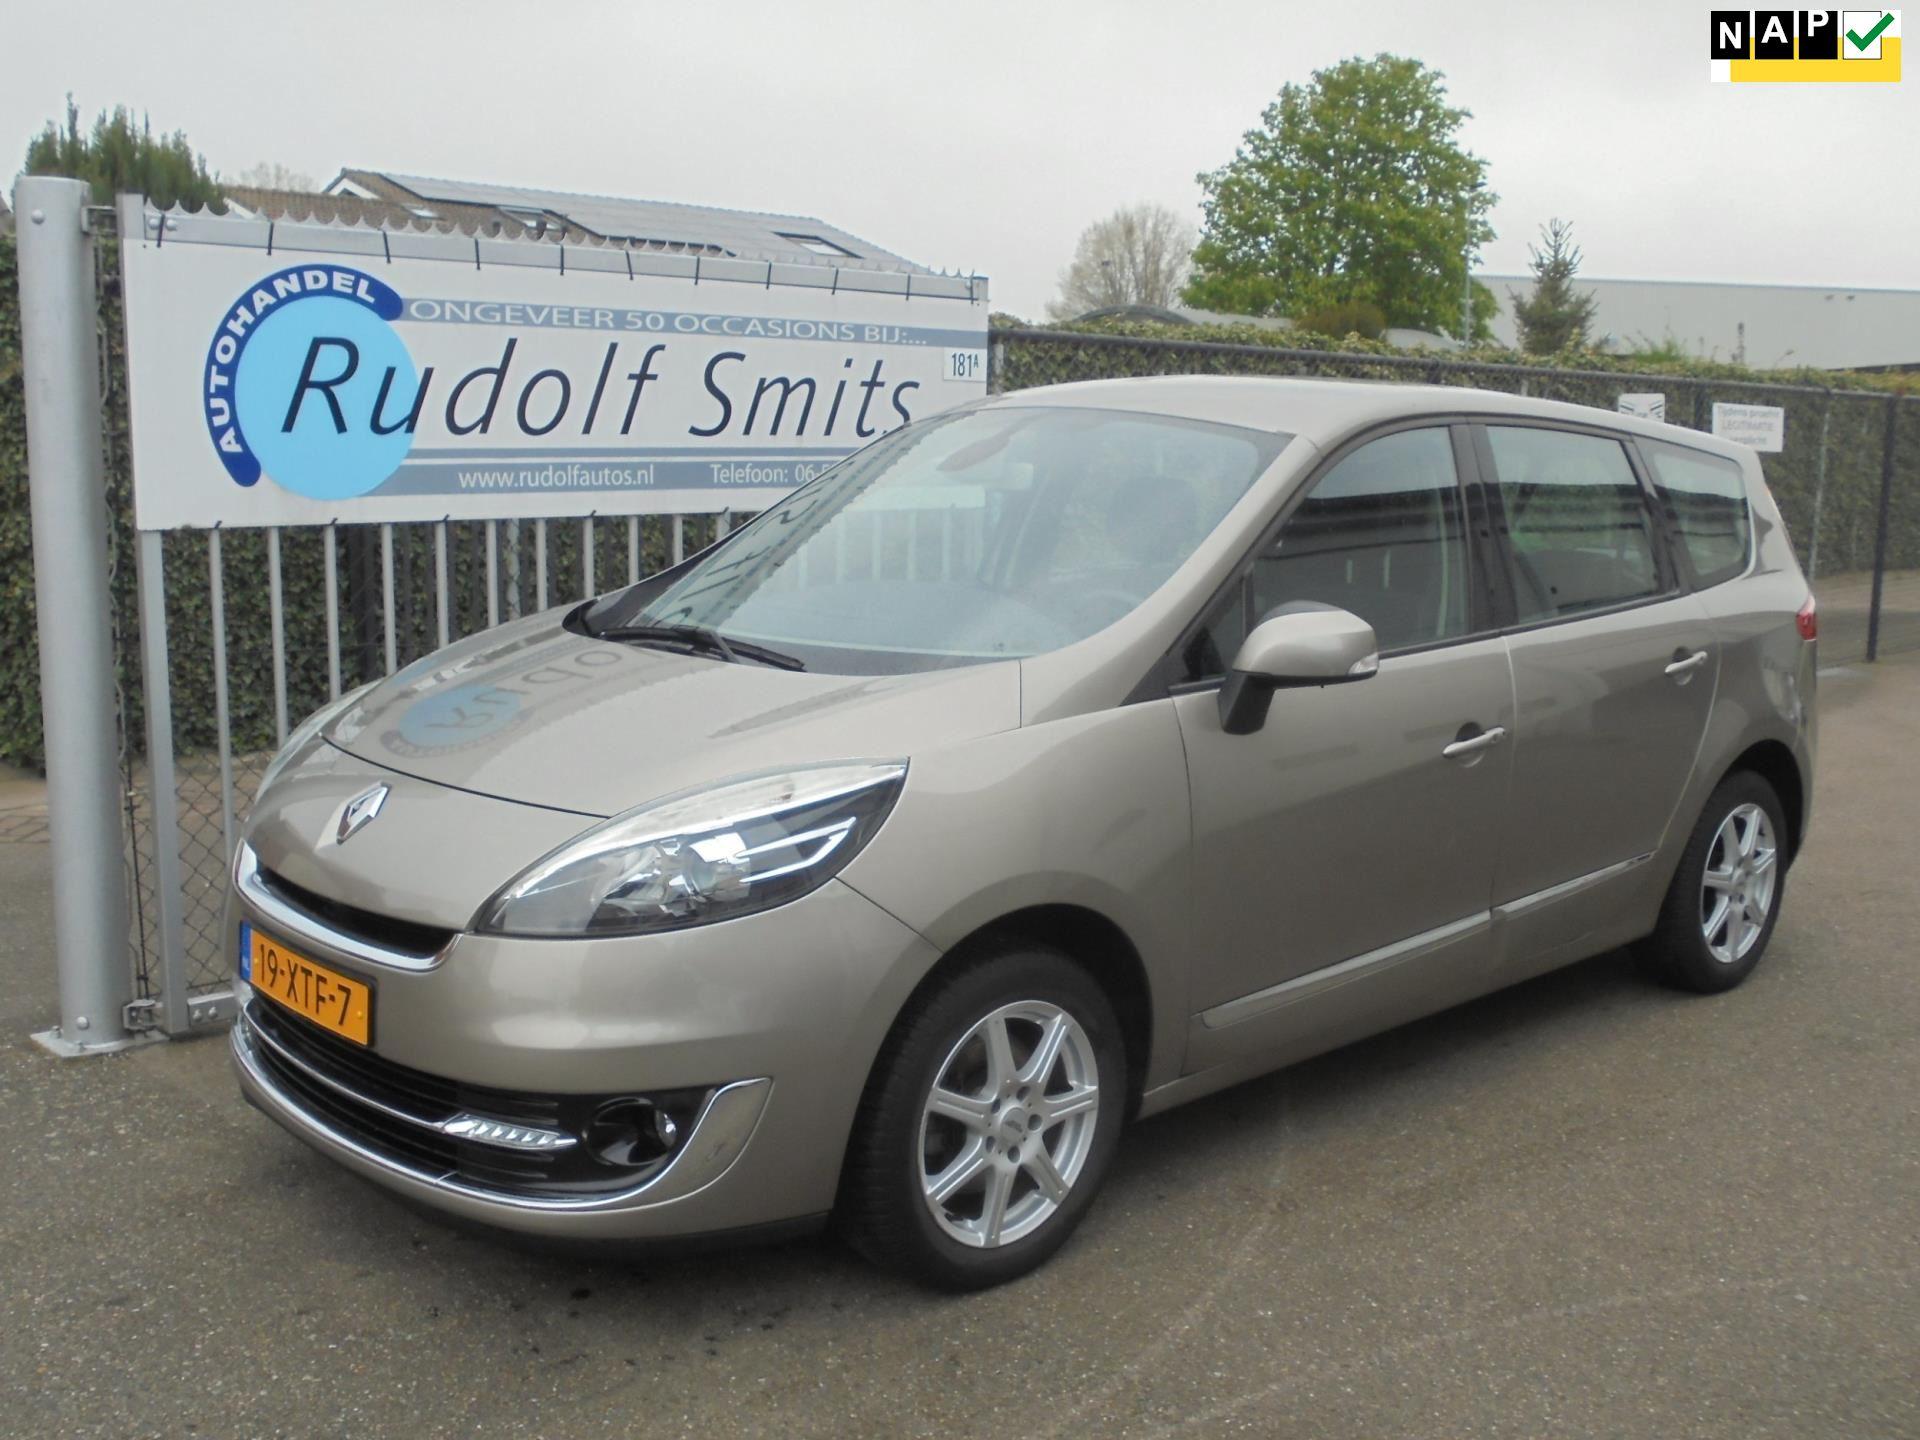 Renault Grand Scénic occasion - Autohandel Rudolf Smits